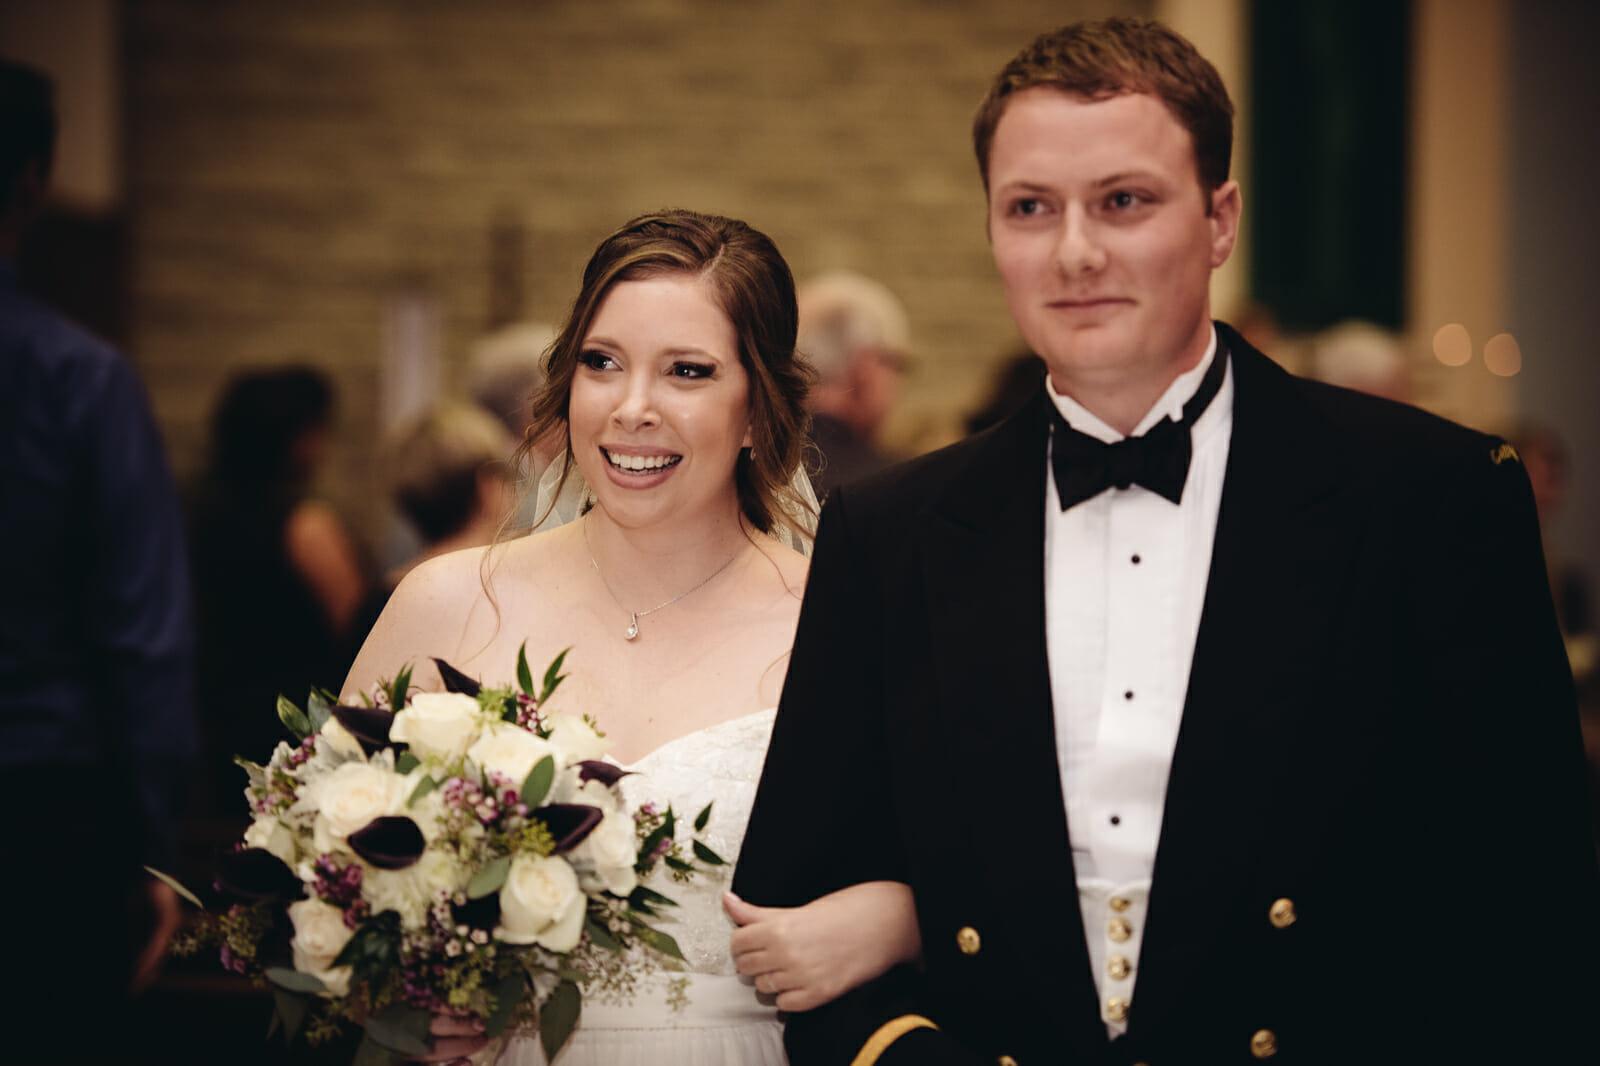 couple walks down the aisle as newlyweds